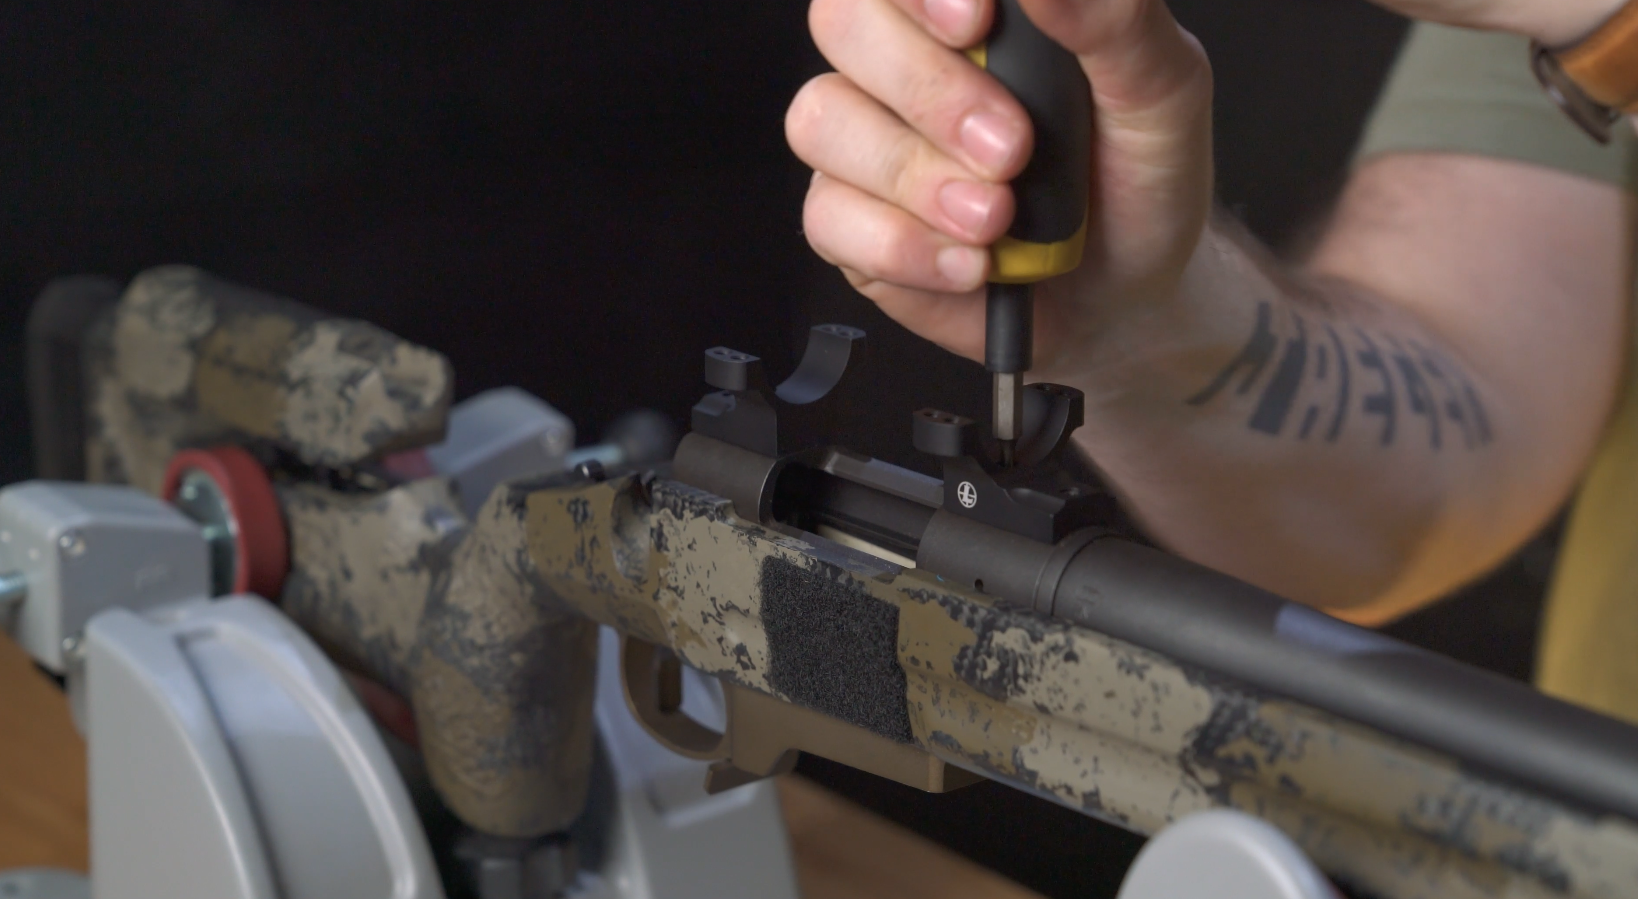 installing mounts on rifle